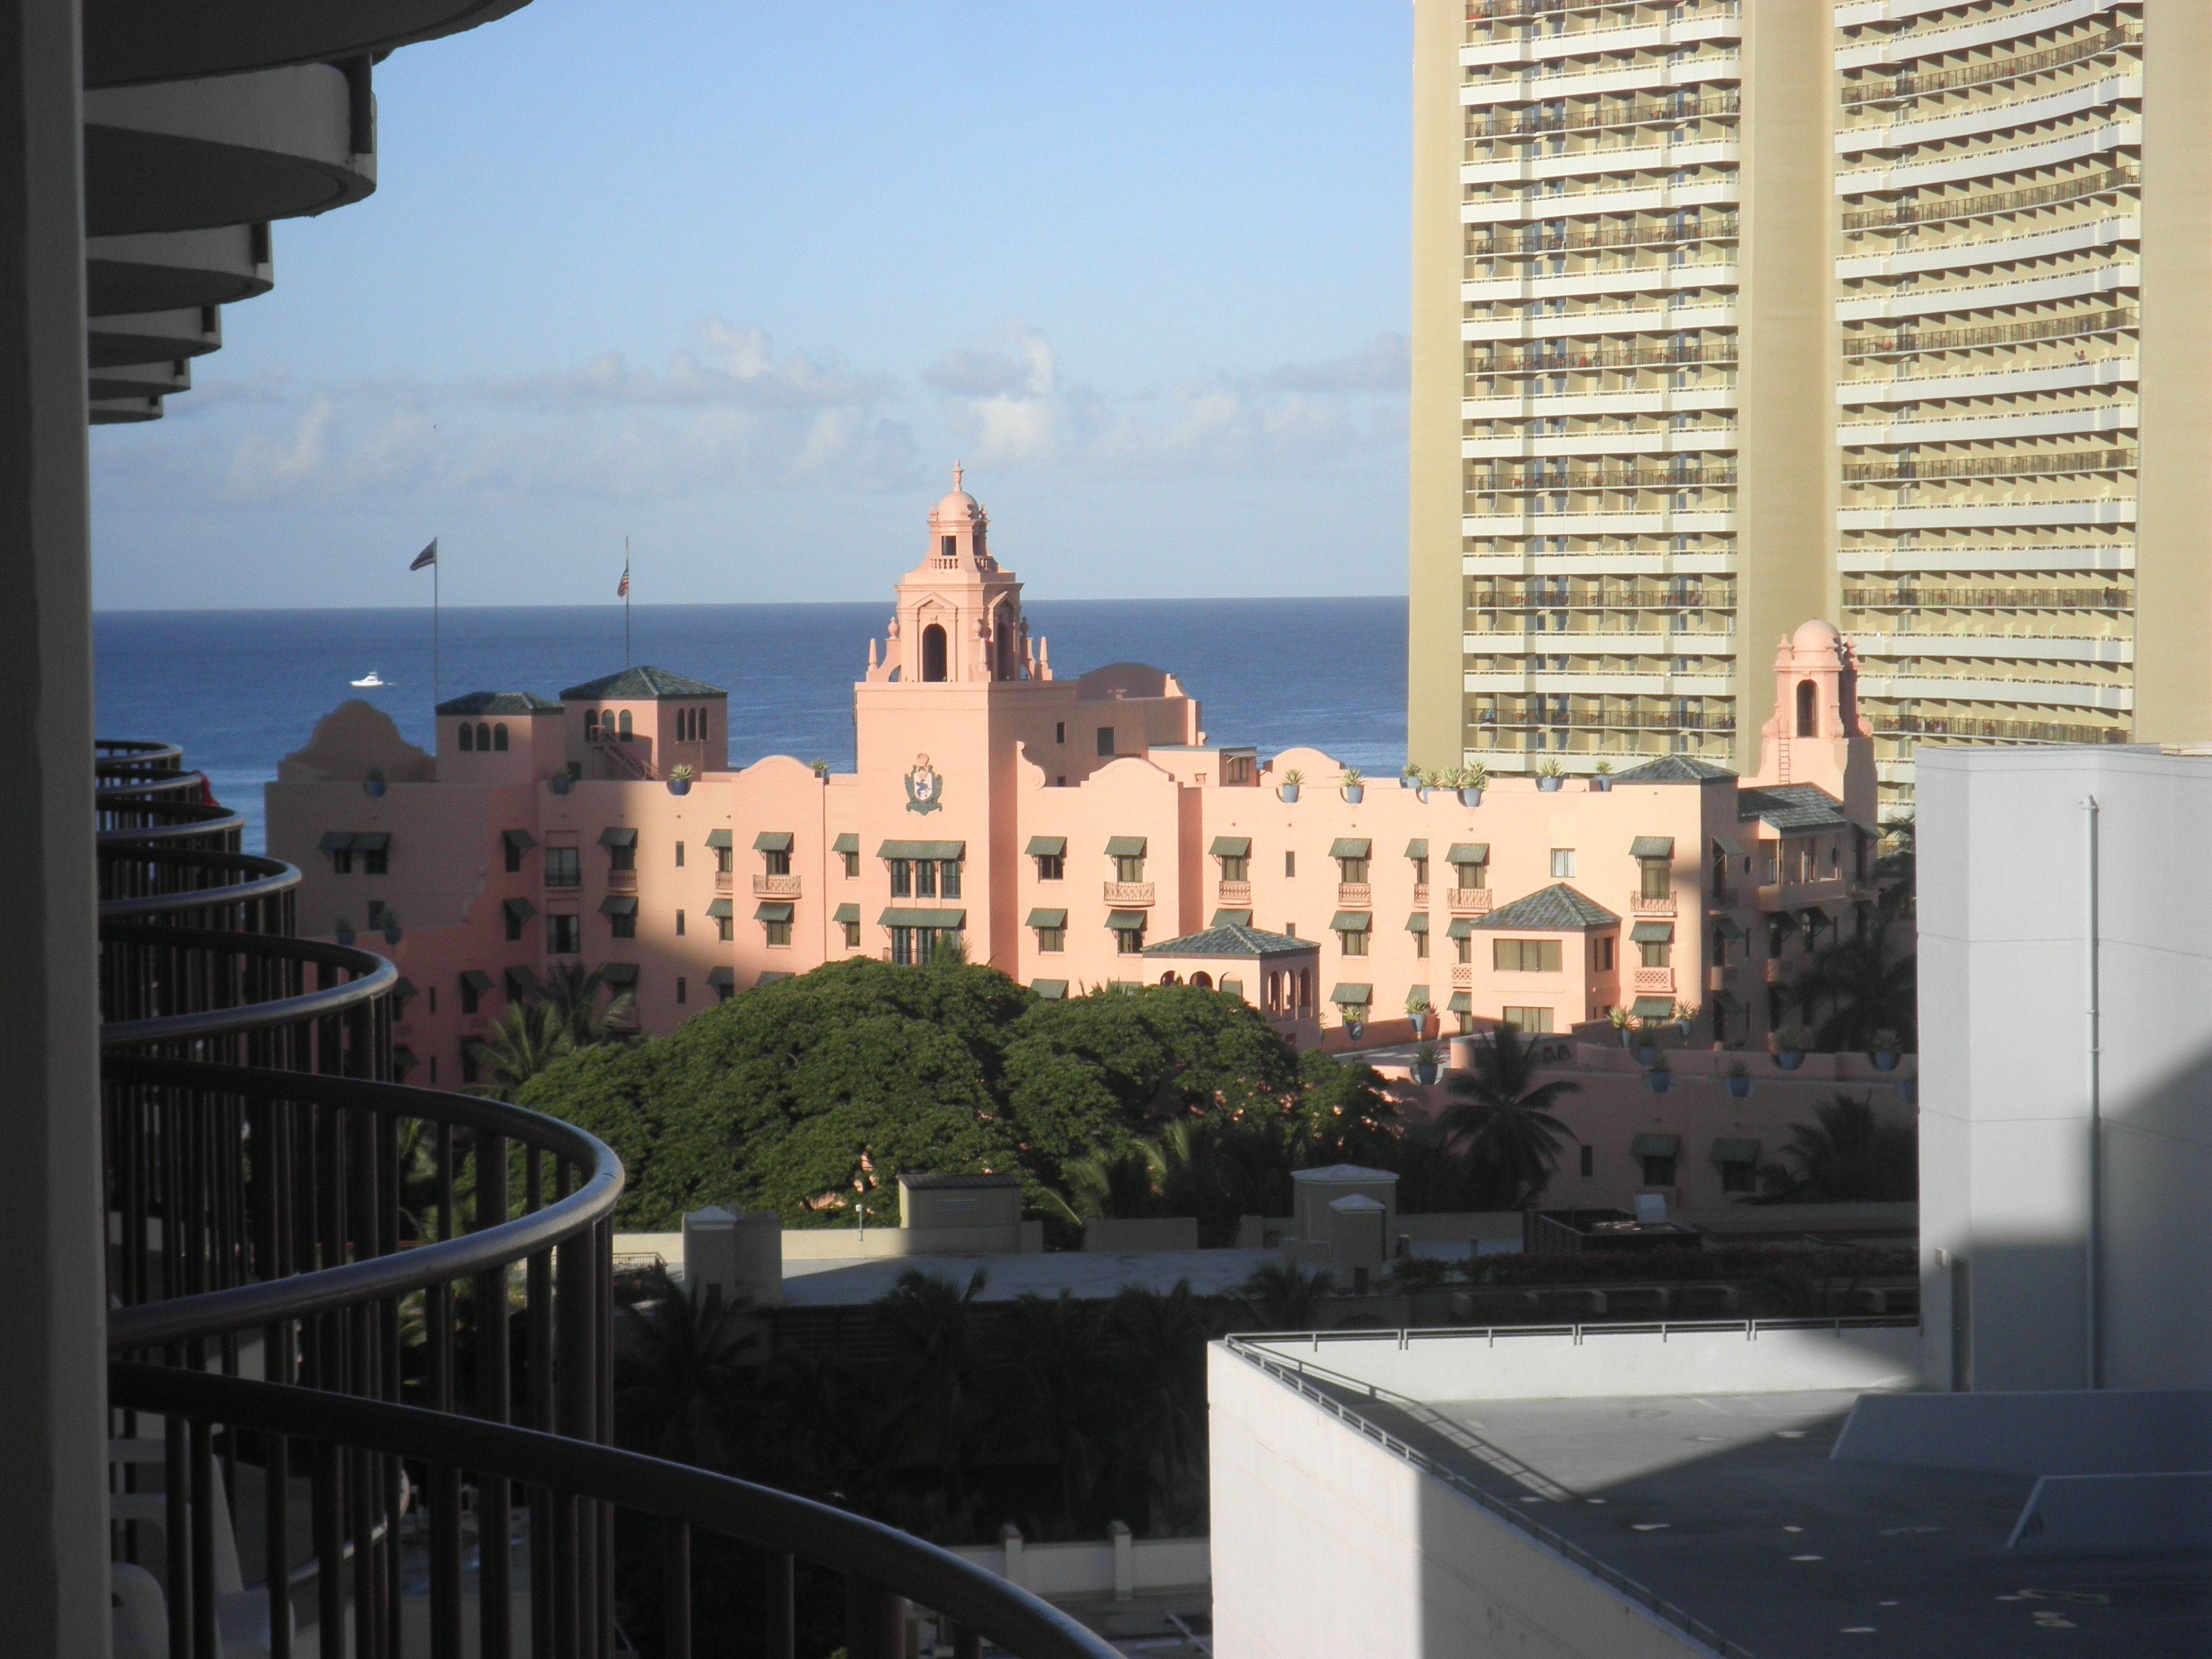 The view (including The Royal Hawaiian) from Room 12.02, Aqua Waikiki Wave on Kuhio Avenue, Waikiki.